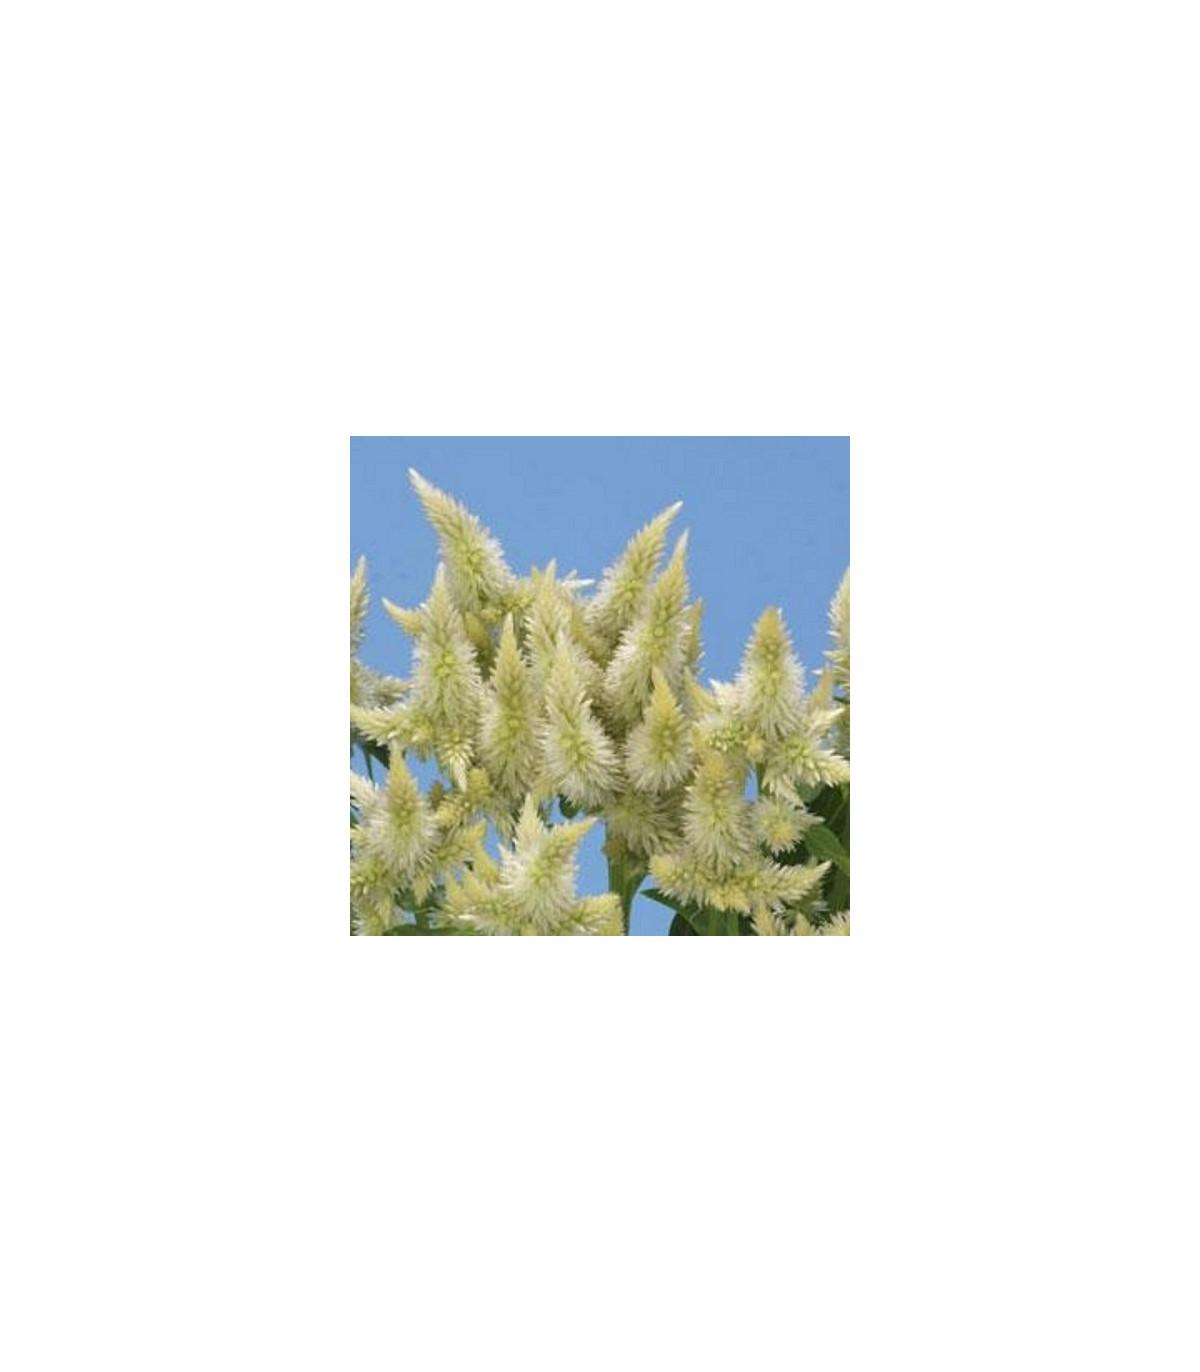 Nevadlec klasnatý bílý - Celosia spicata - prodej semen - 10ks